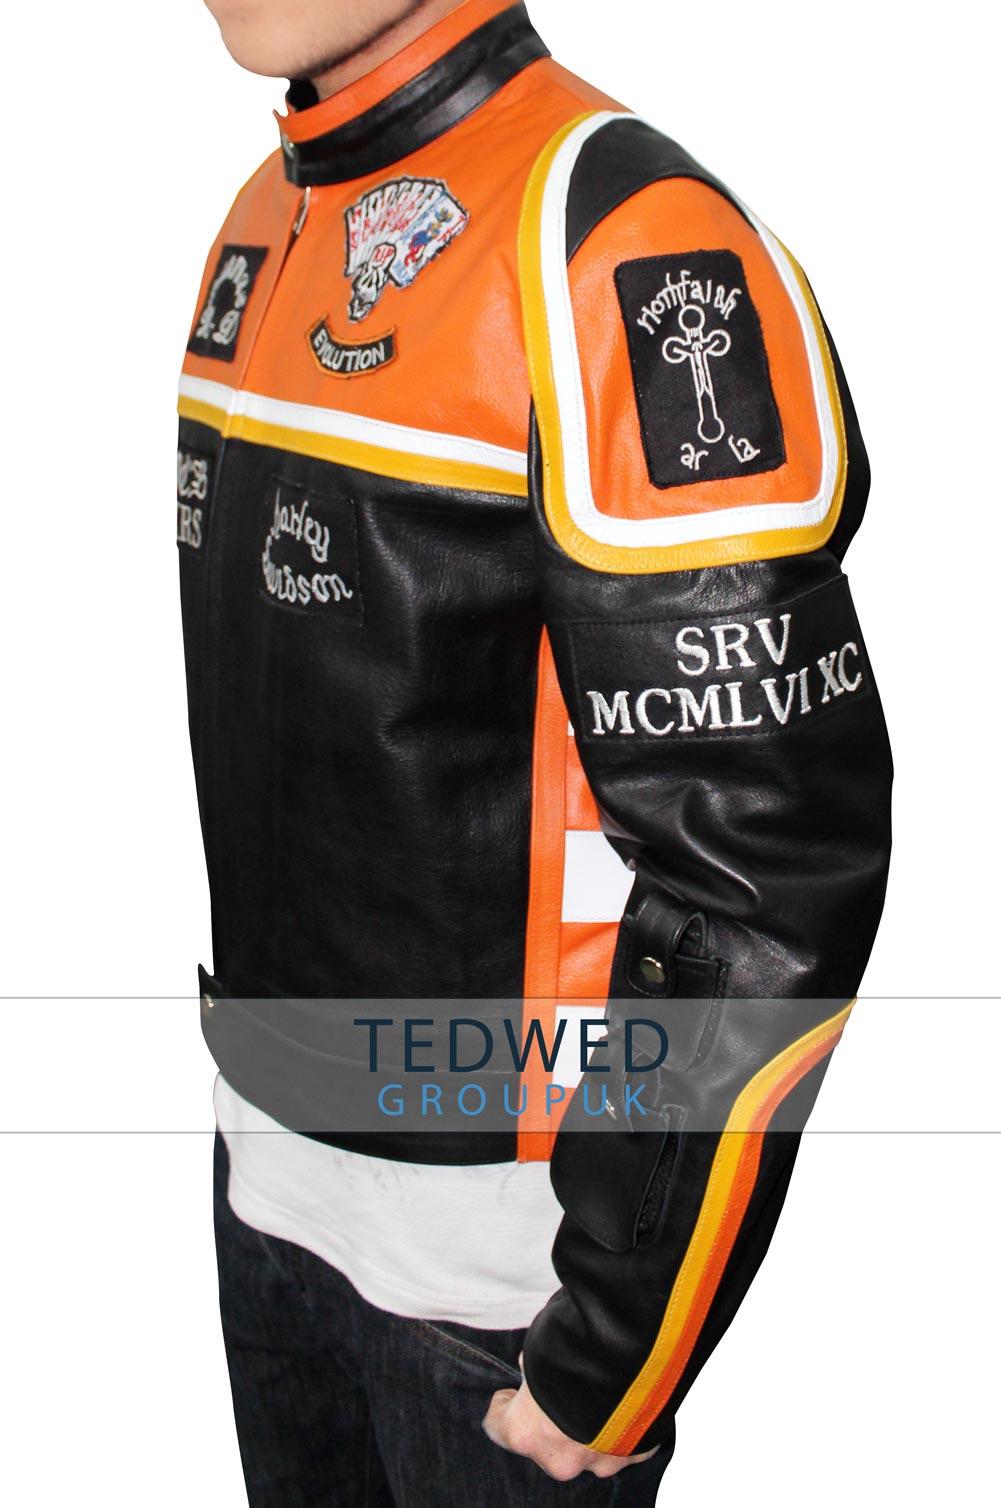 Men's Ride Ready Leather Jacket